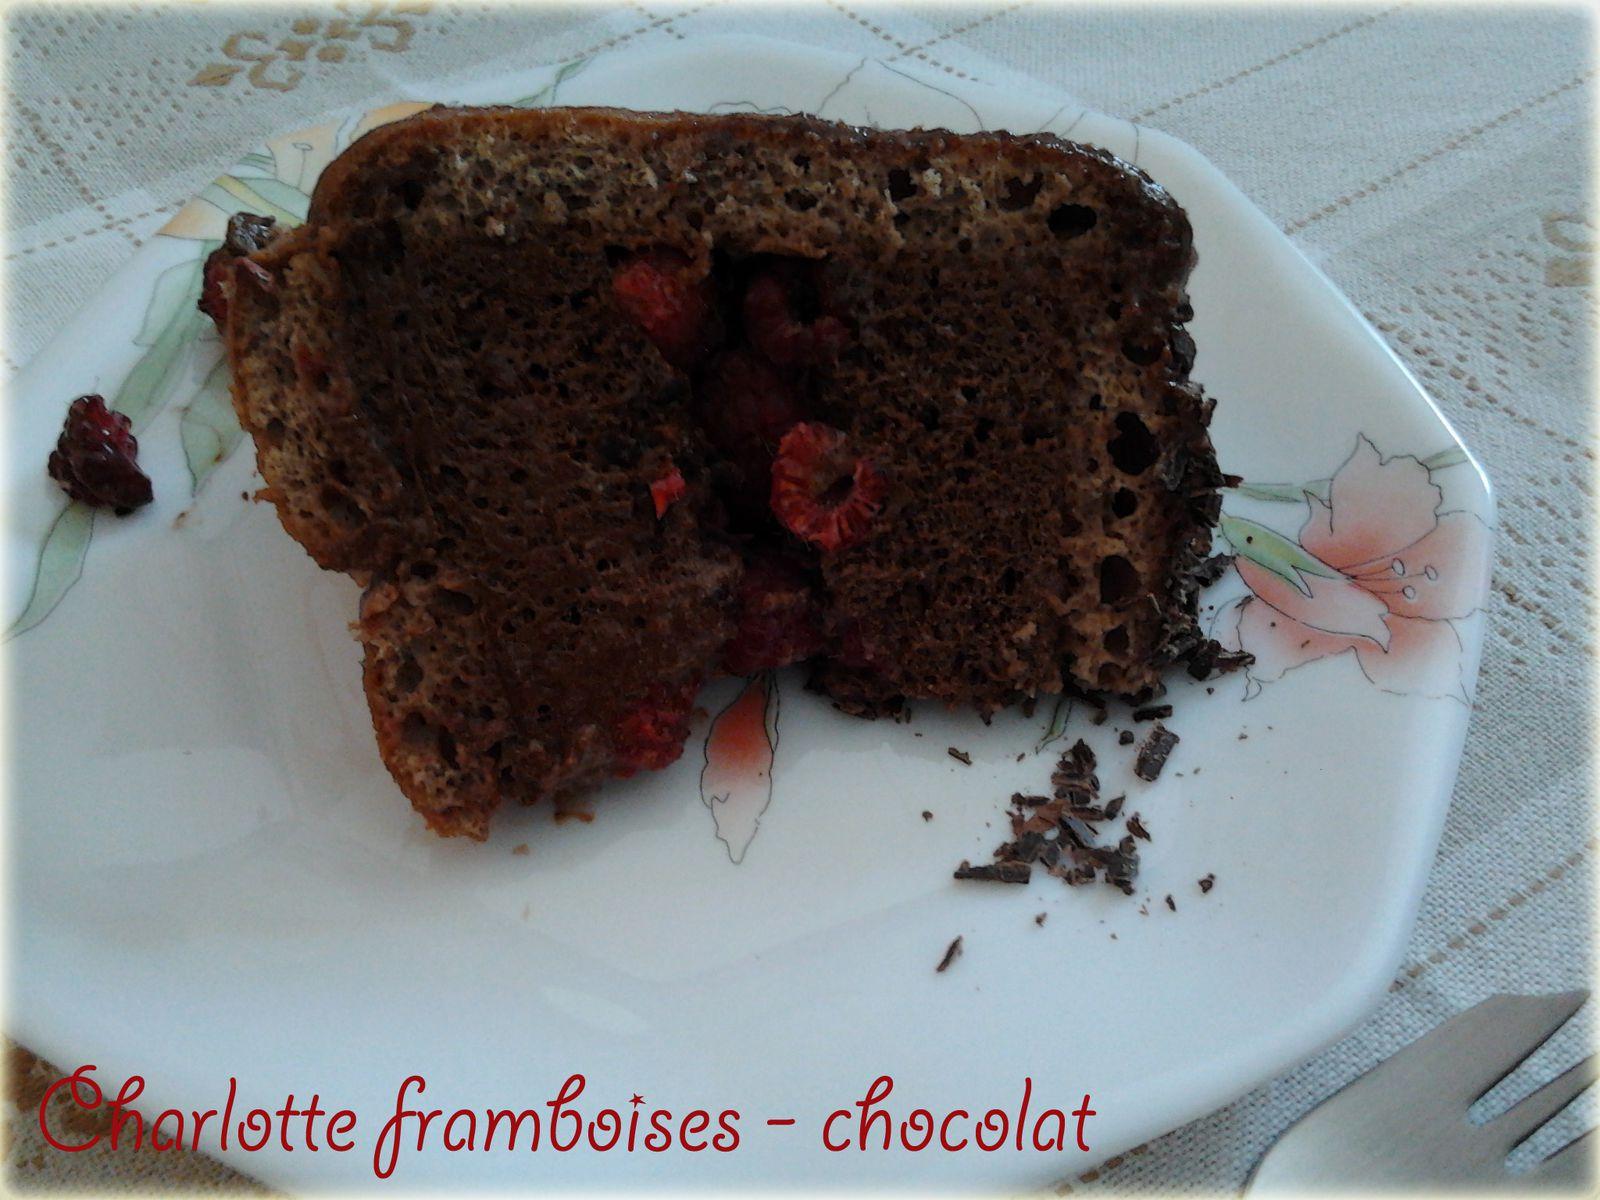 Charlotte framboises - chocolat